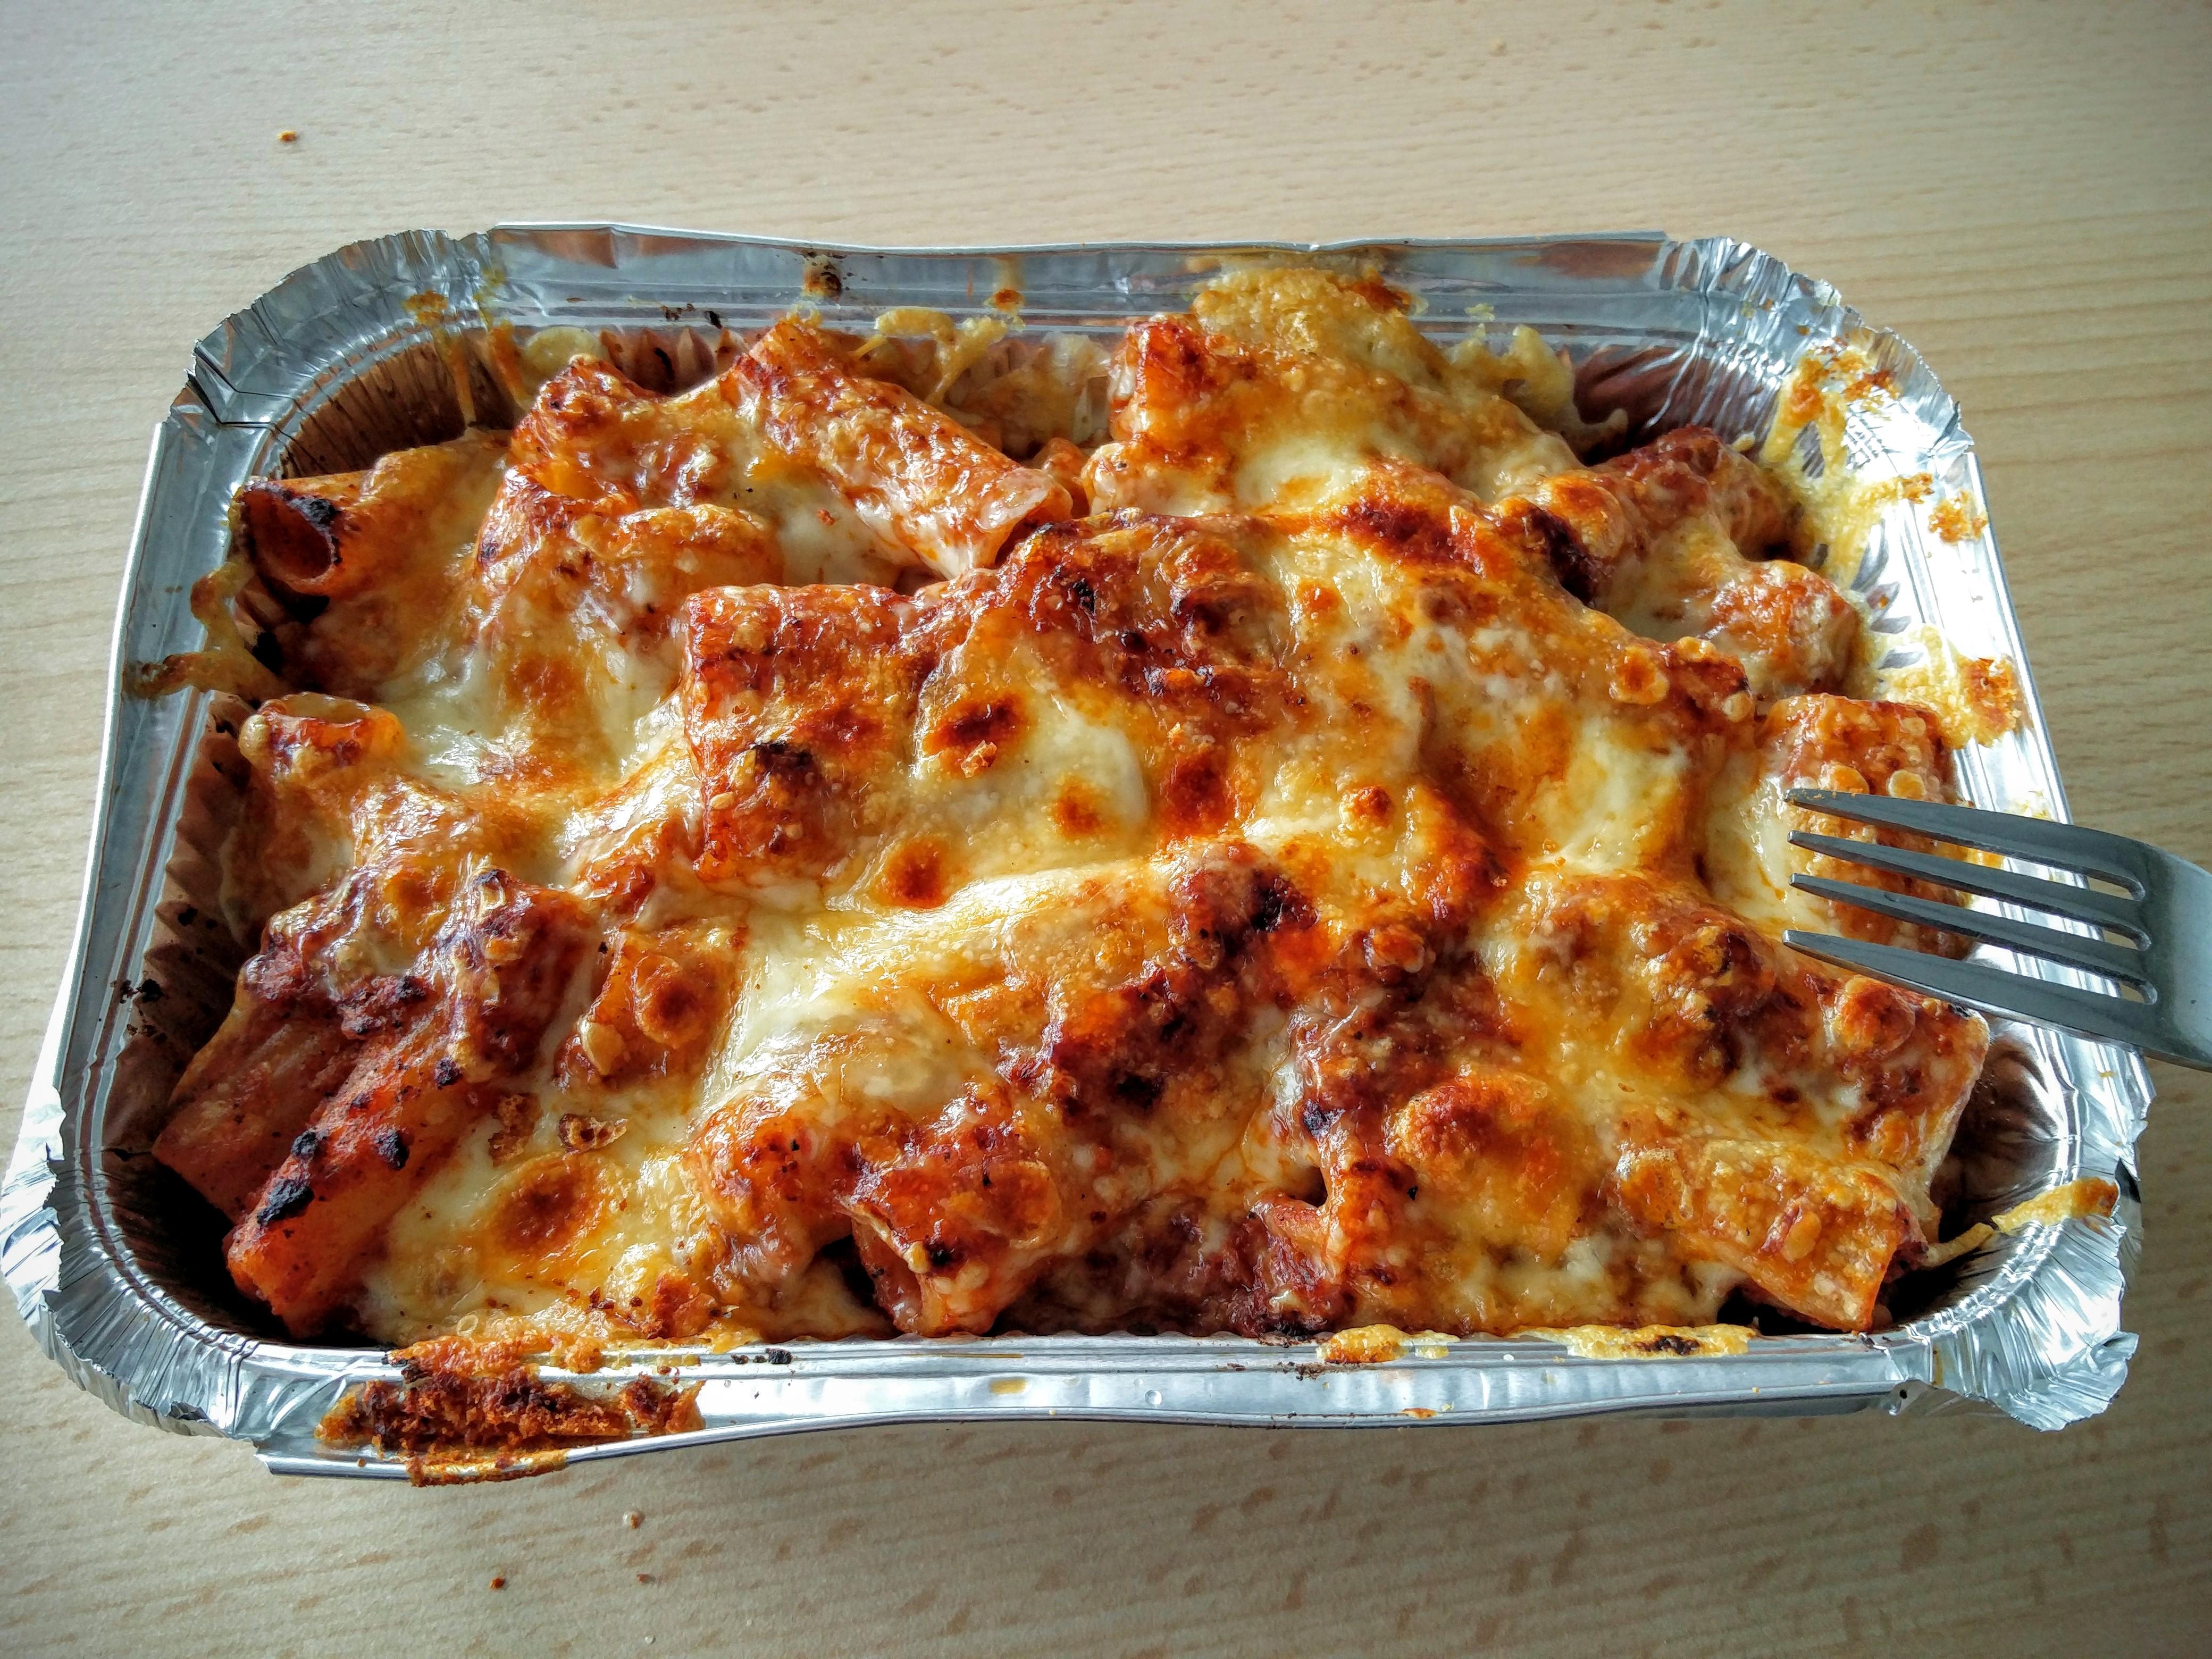 https://foodloader.net/nico_2015-12-02_rigatoni-al-forno.jpg